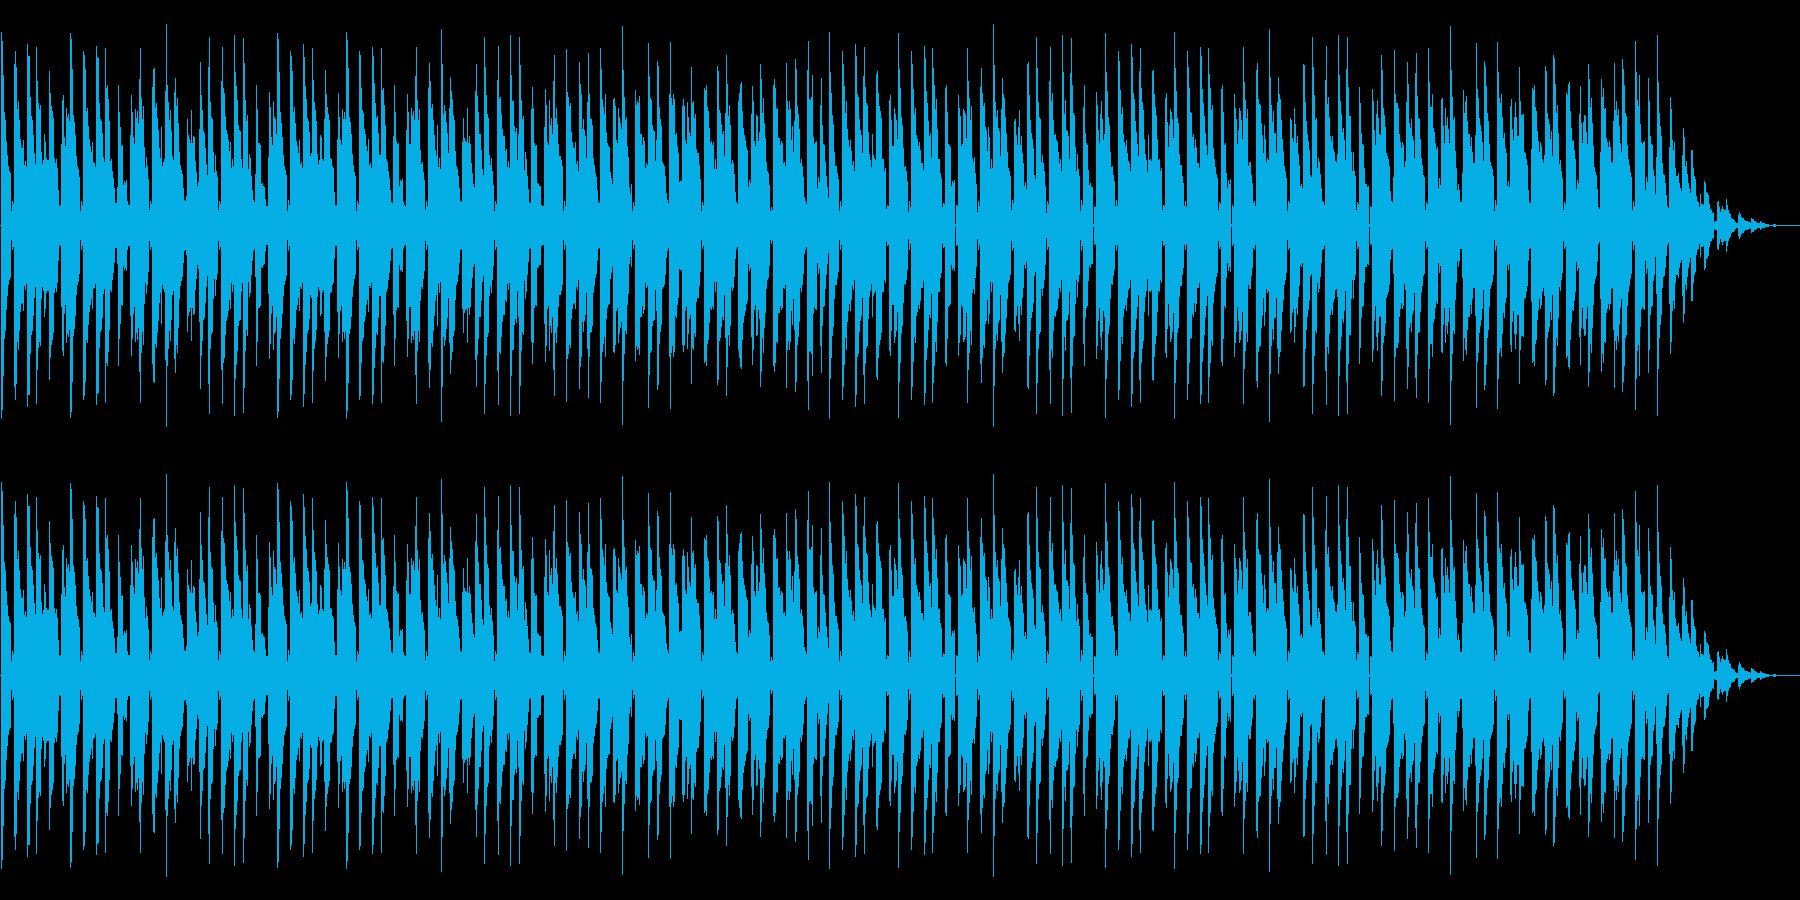 GB風RPGのエンディング曲の再生済みの波形